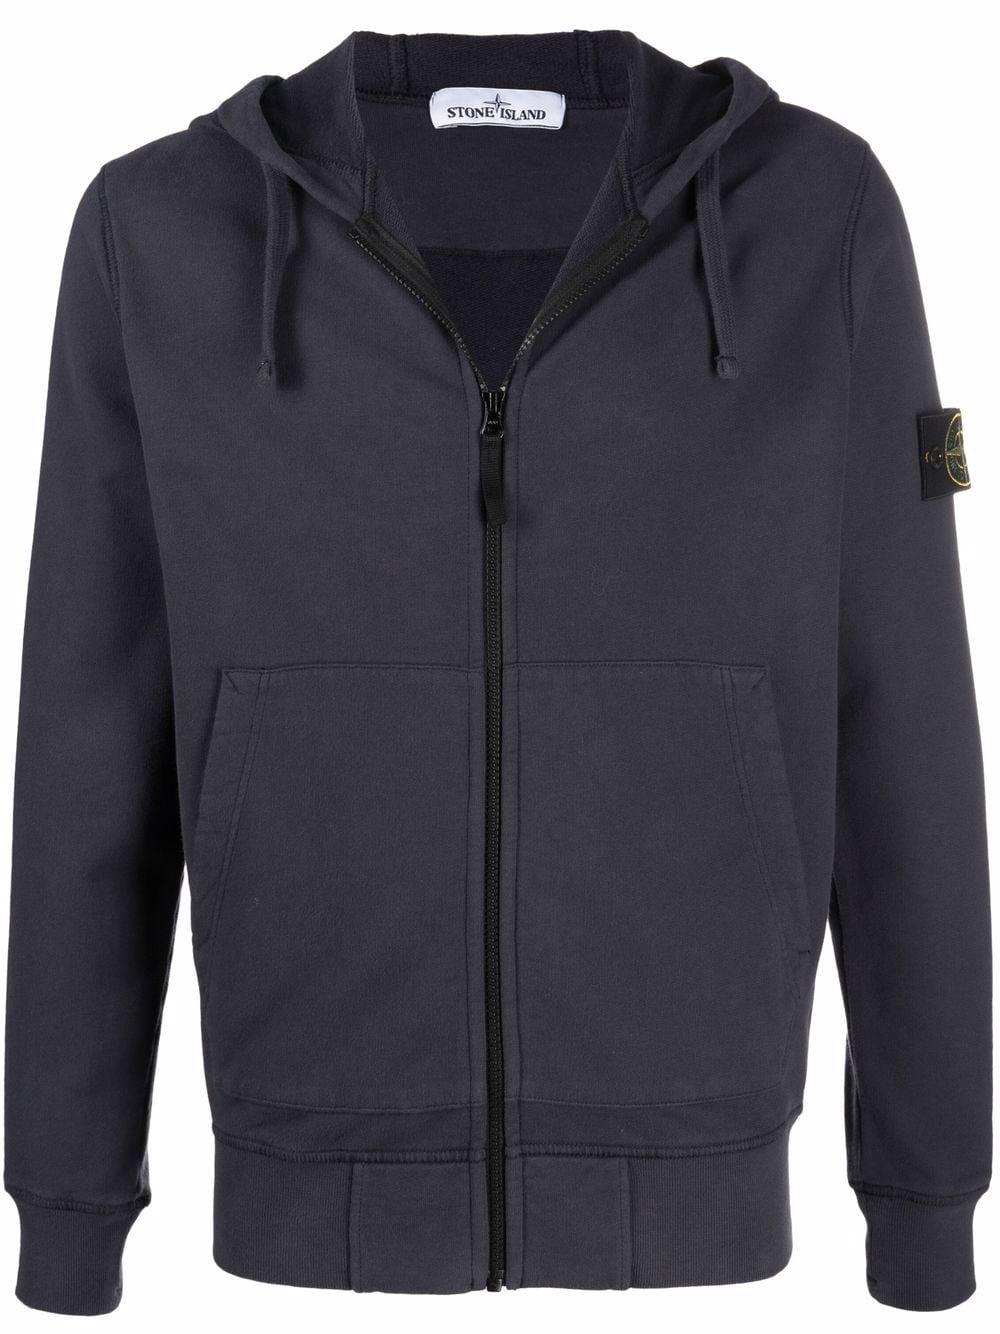 <p class='small-title'>STONE ISLAND</p>Zip-Up Sweatshirt